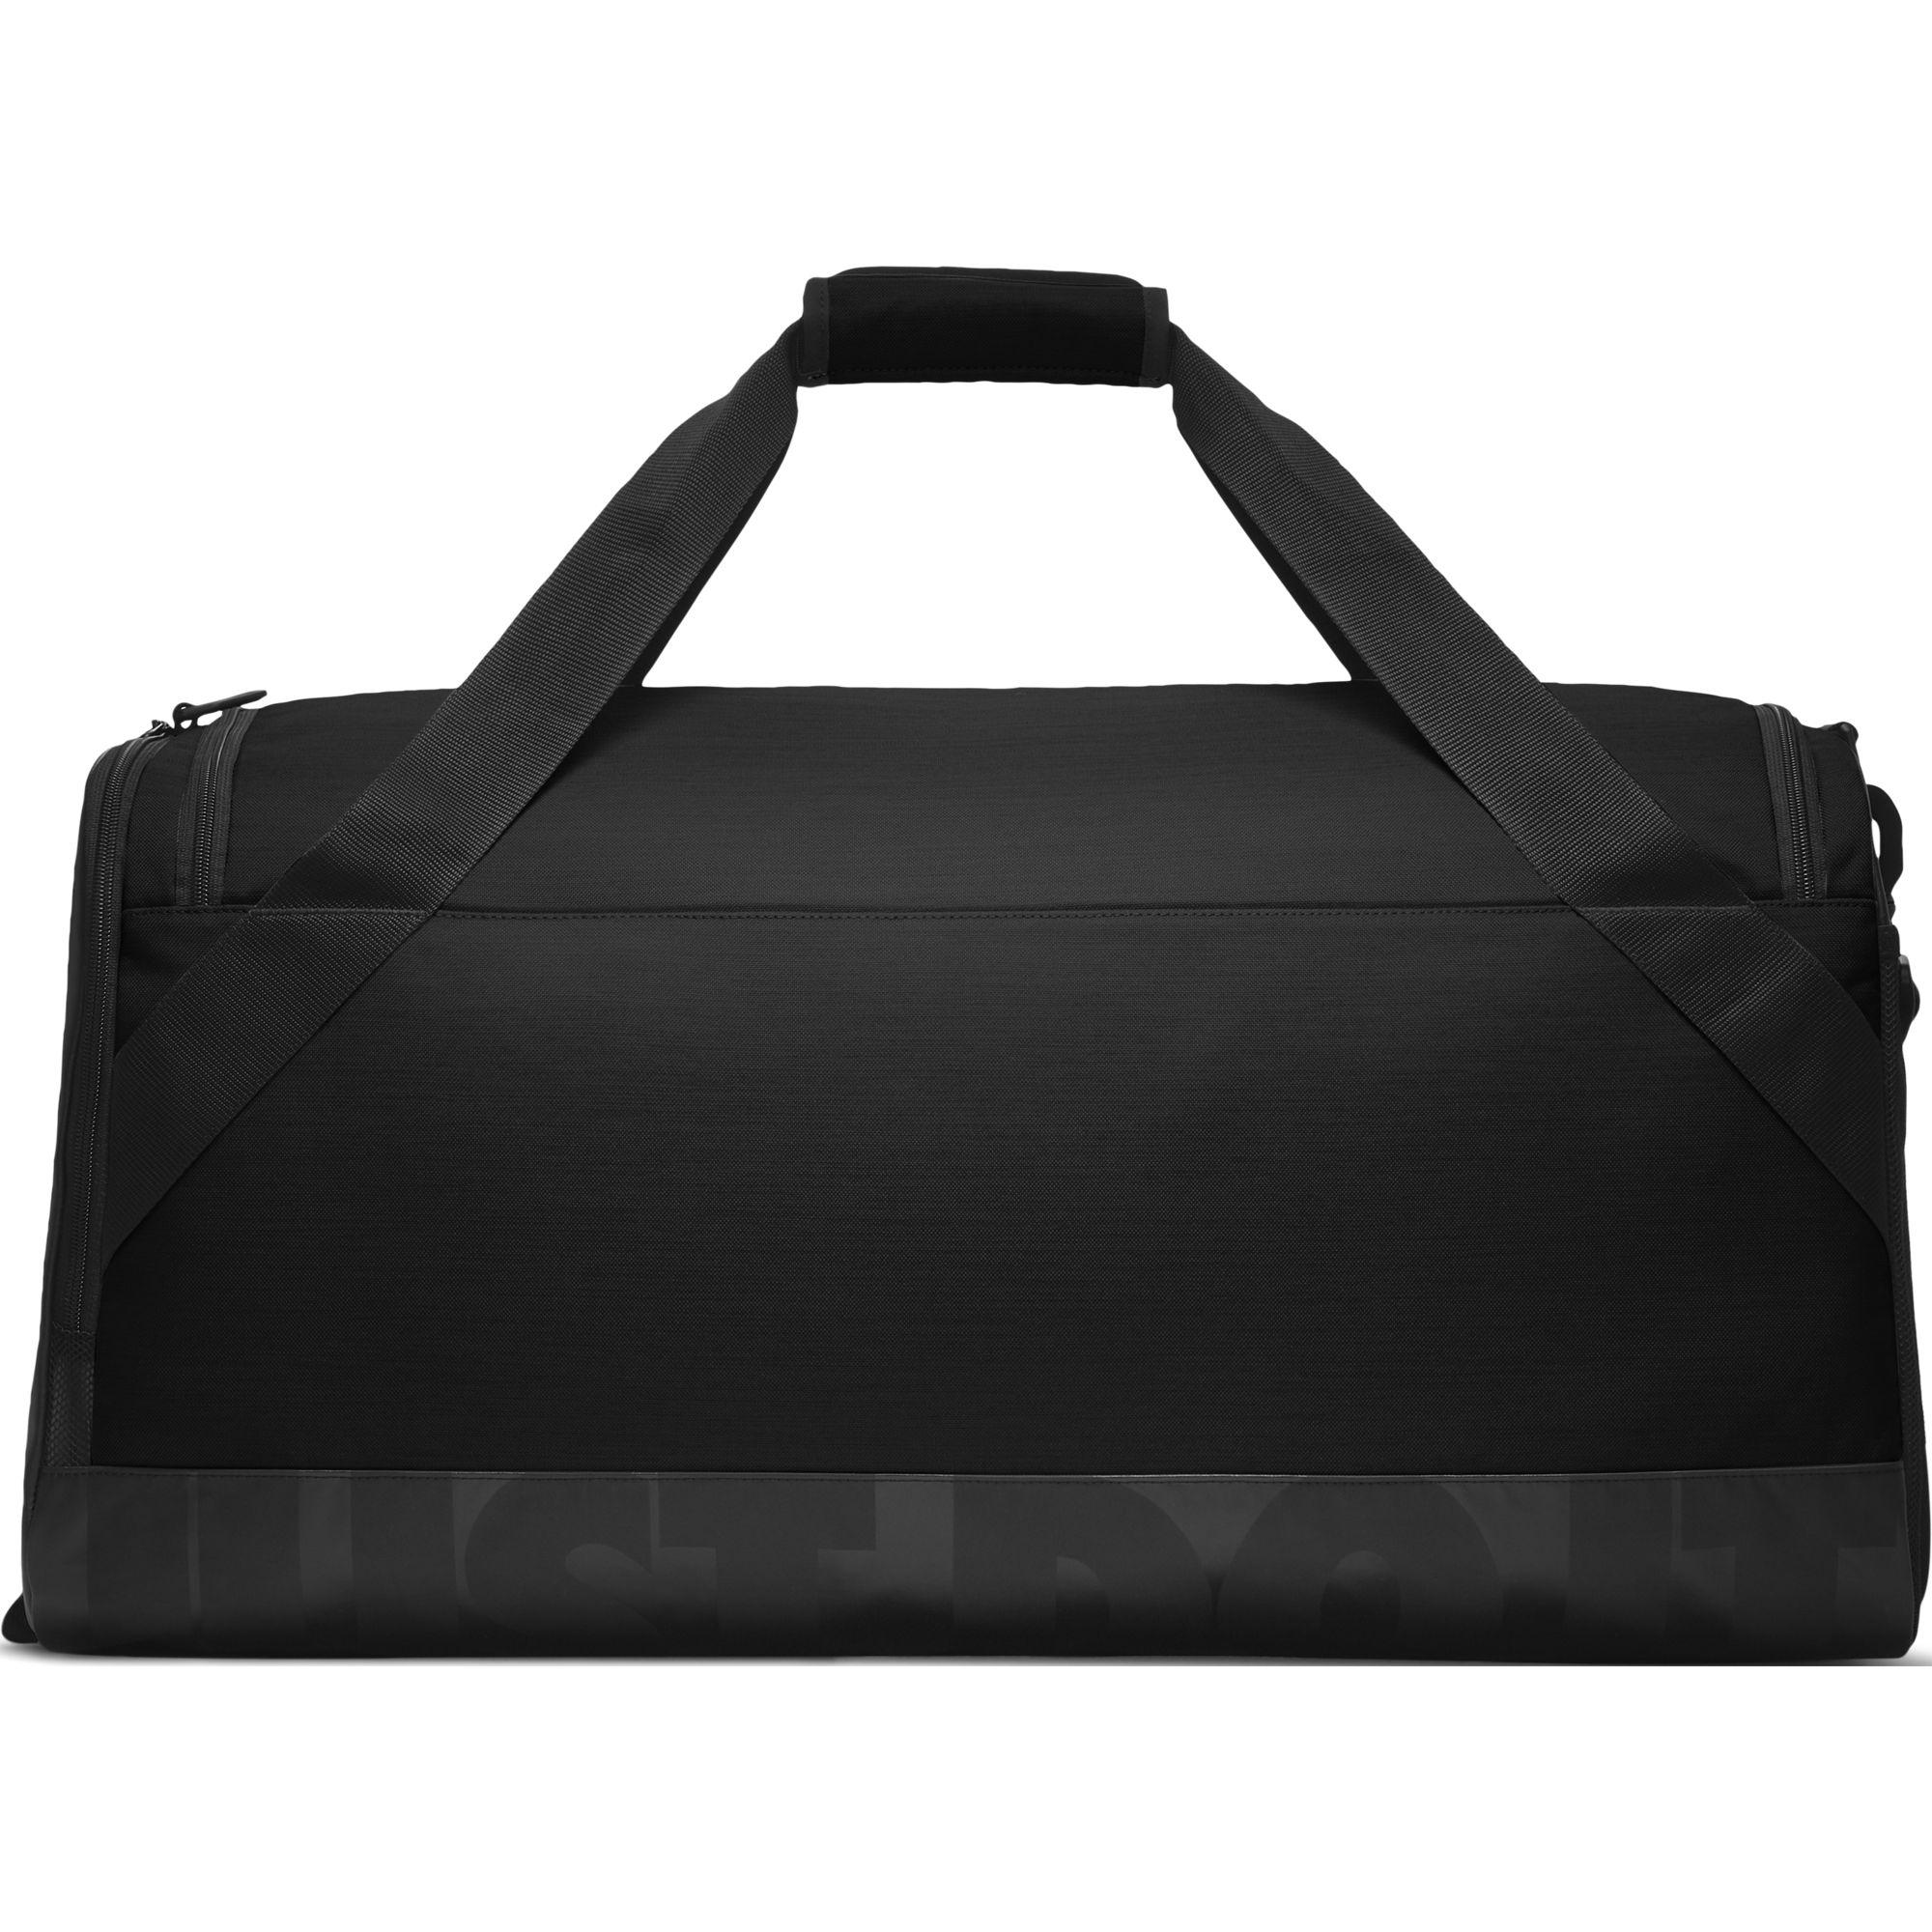 e2fcfac34bdbc ... torba Nike Brasilia (Large) Training Duffel Bag BA5333 010 ...